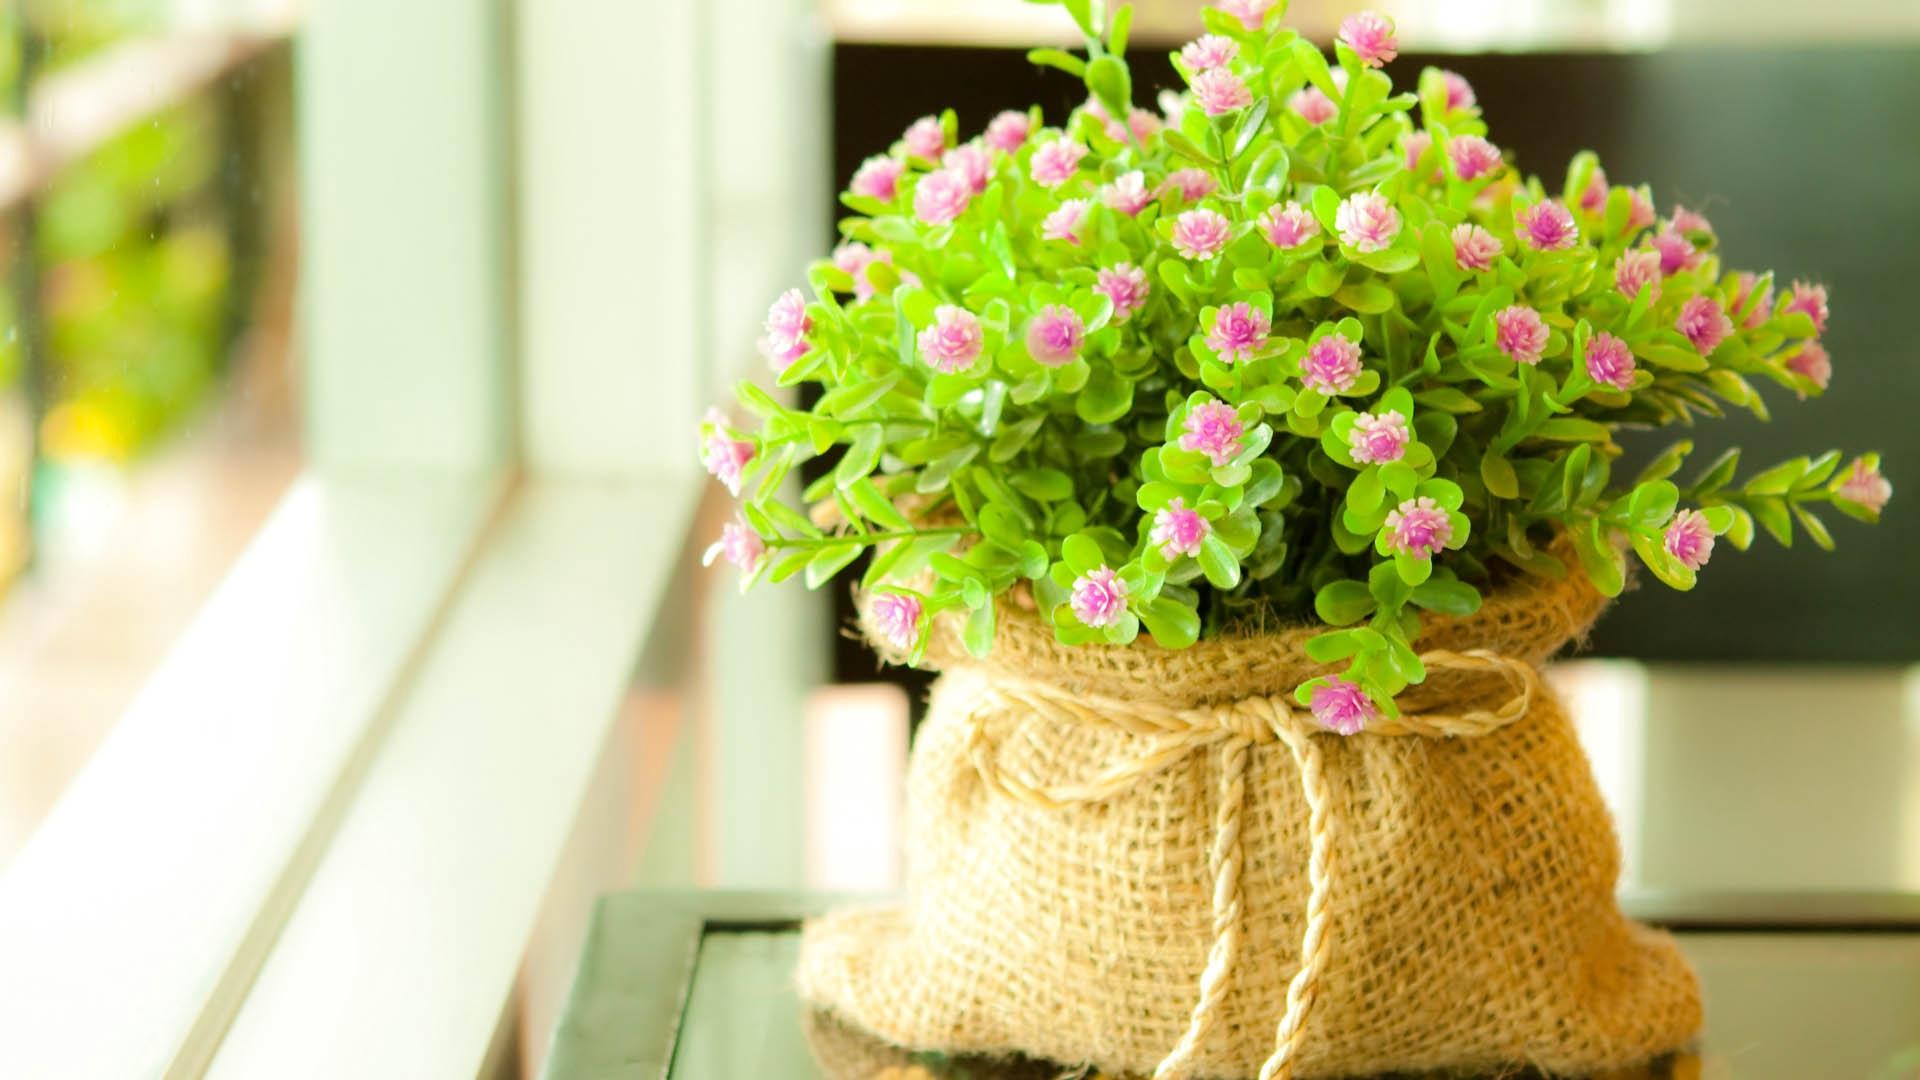 Wallpaper Flowers Bag Flower Cute Wallpapers For Desktop Background Full Screen 559449 Hd Wallpaper Backgrounds Download